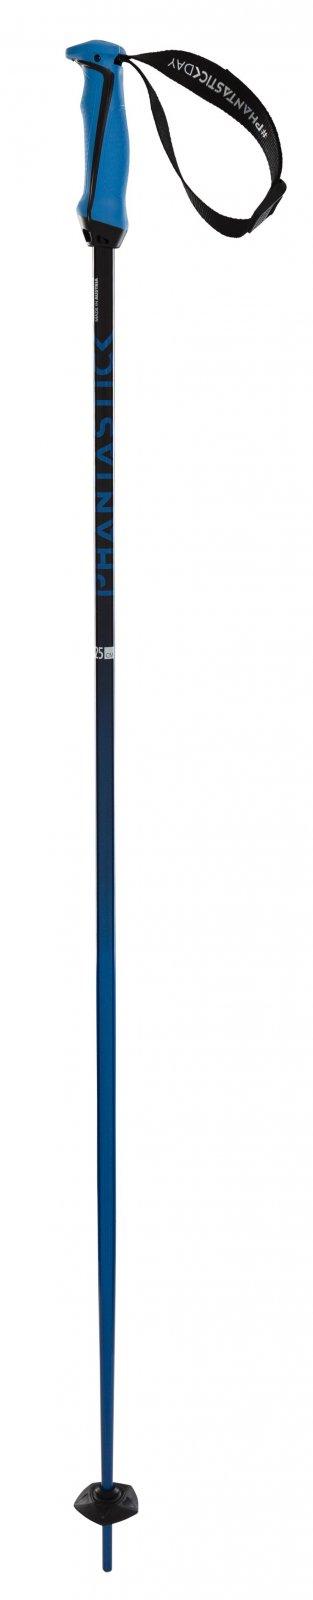 Volkl Phantastick 18mm Ski Poles